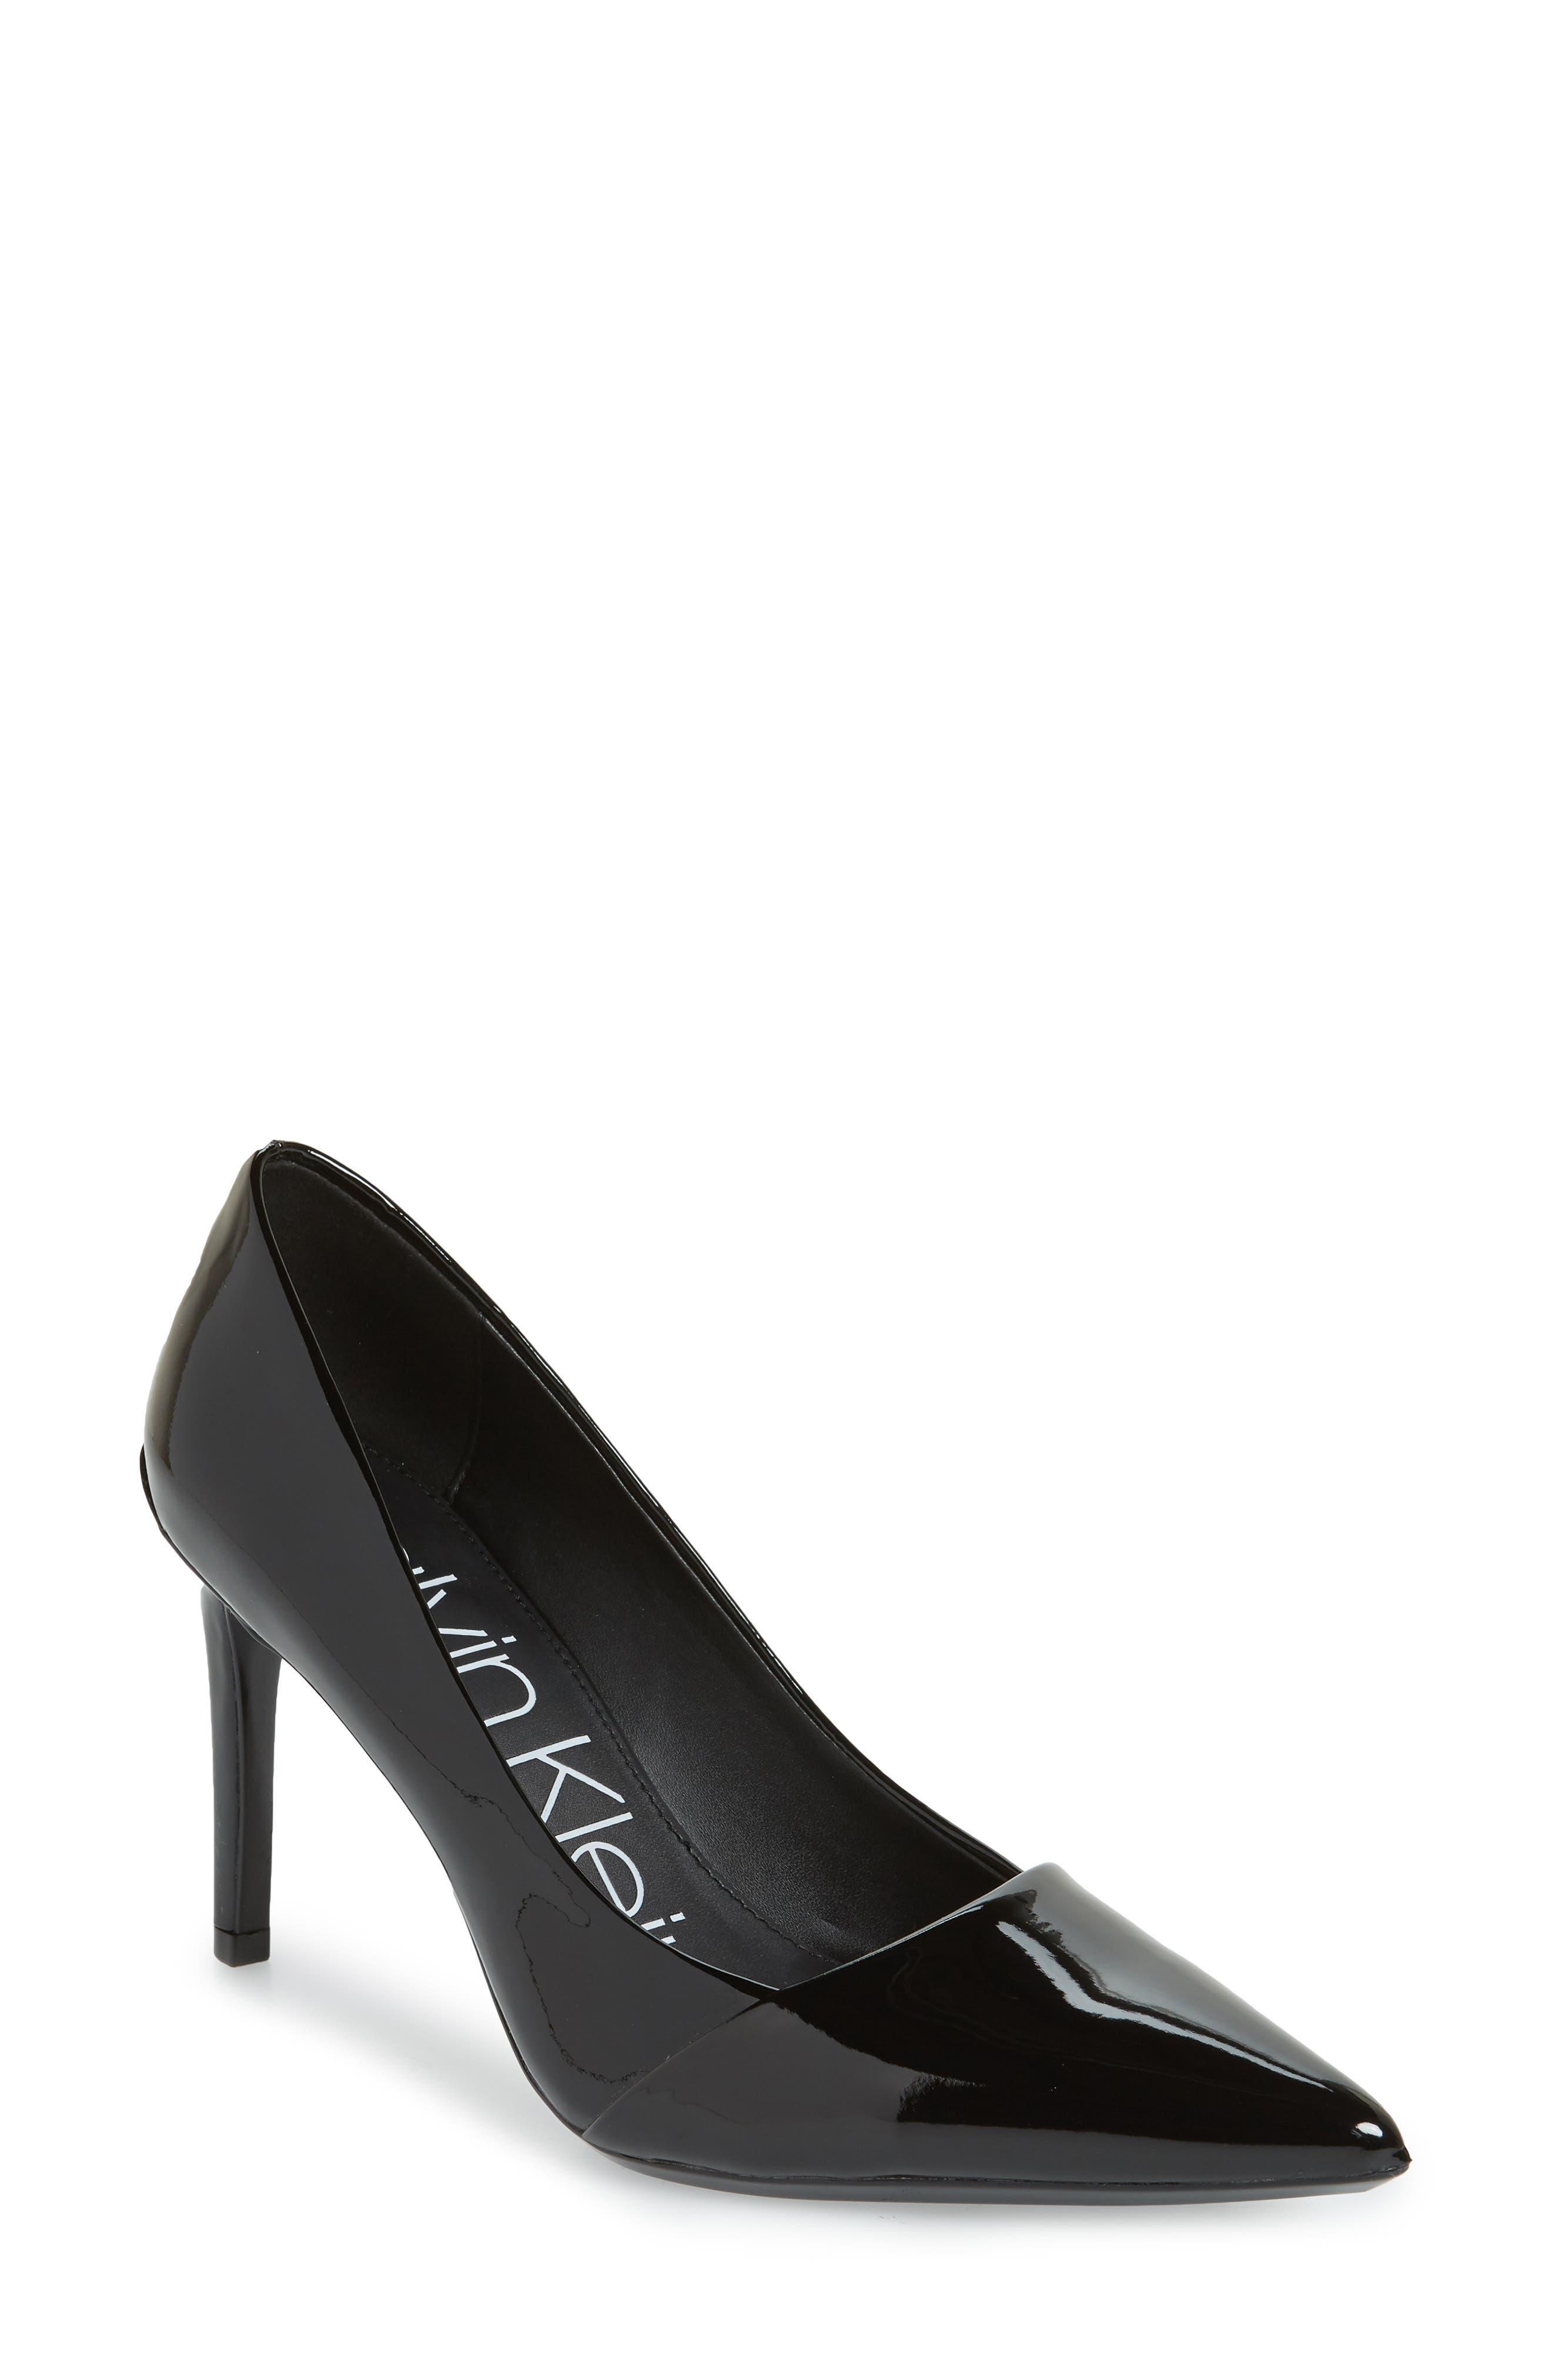 CALVIN KLEIN Roslyn Pointed Toe Pump in Black Leather